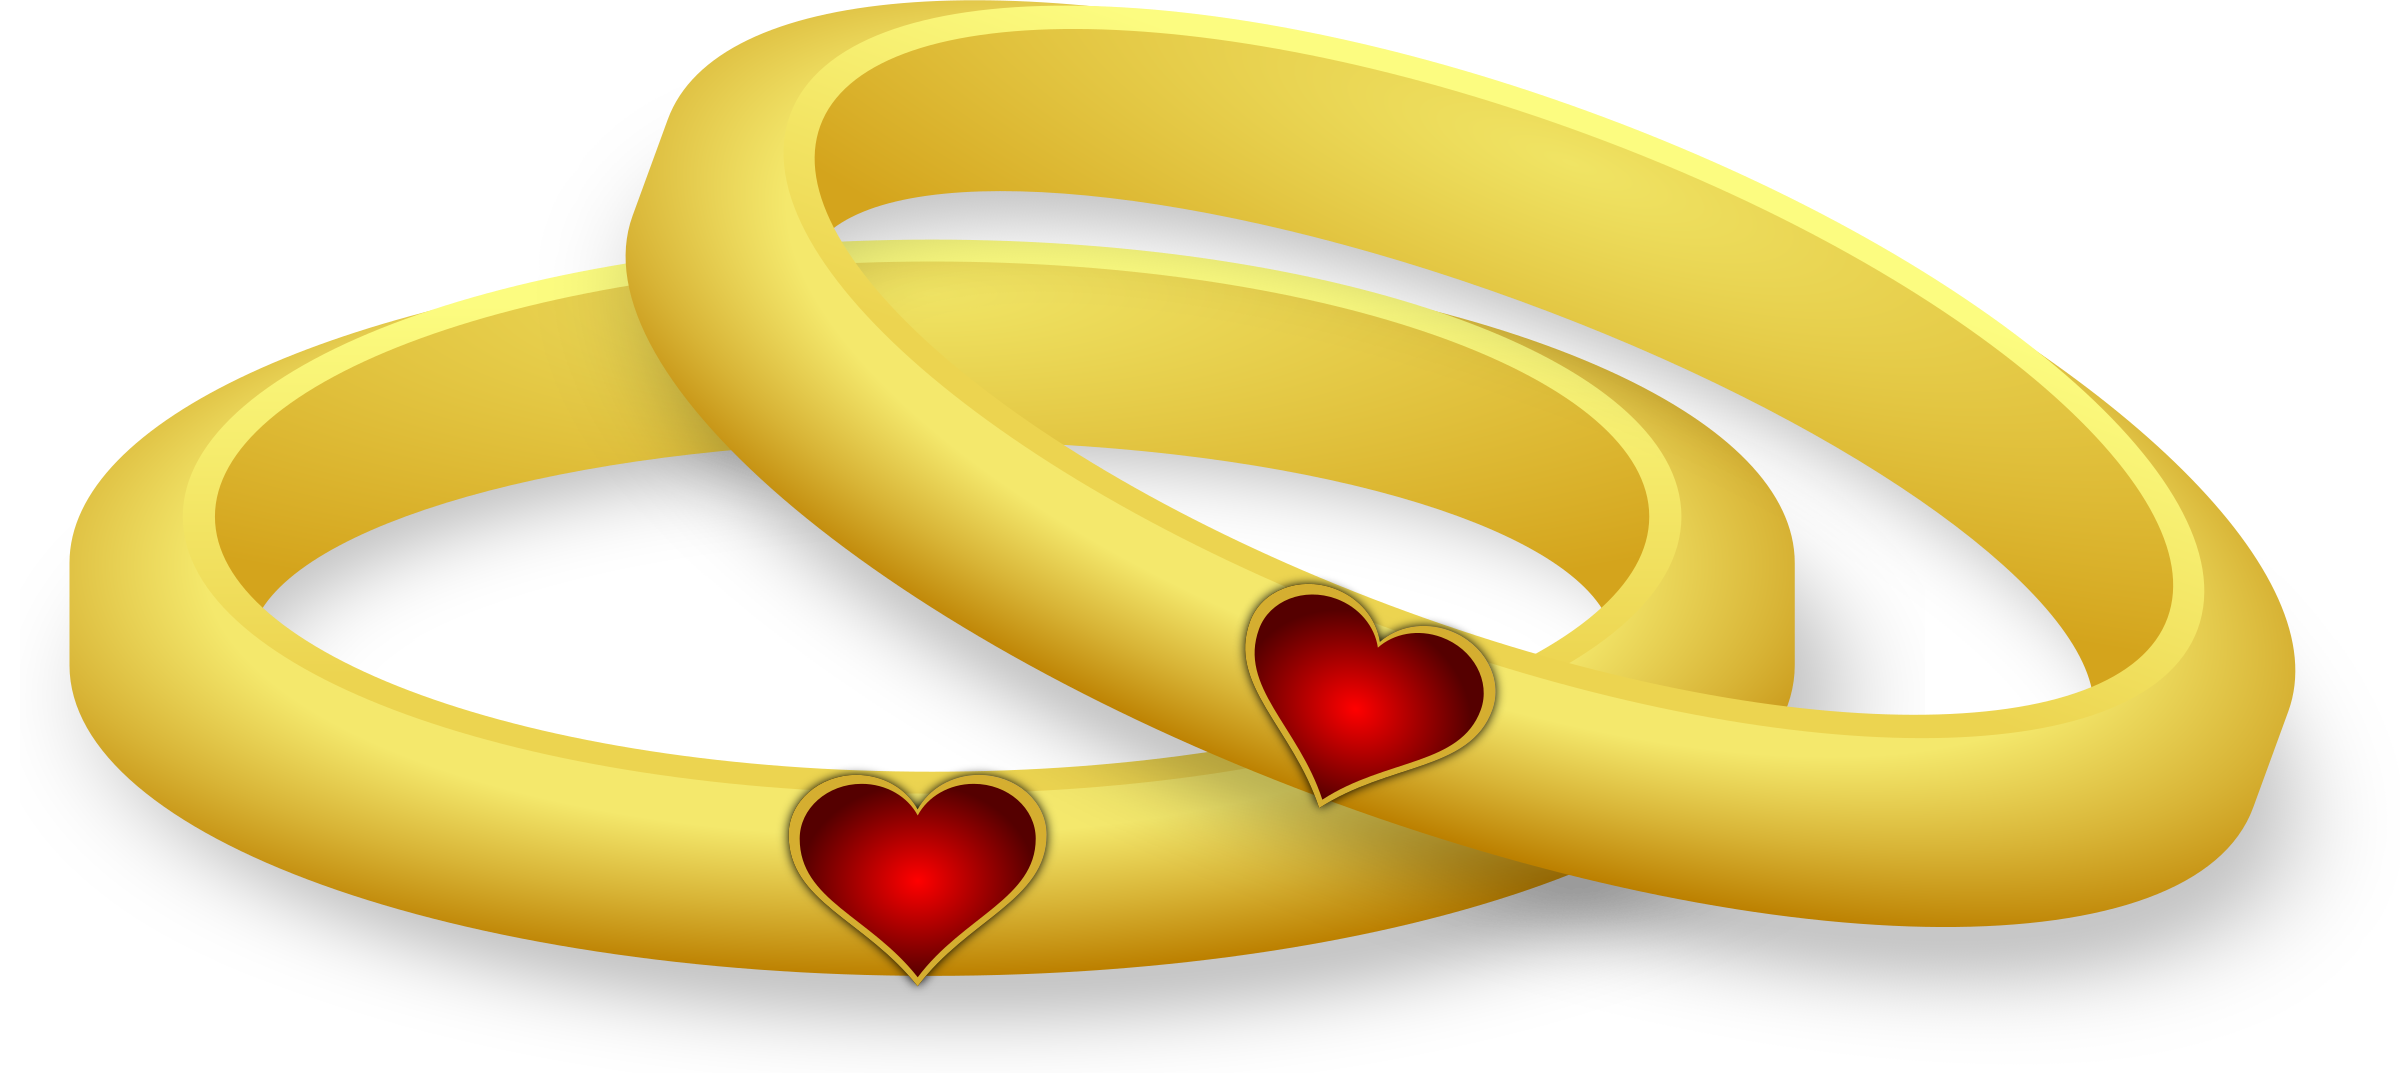 Heart Wedding Png